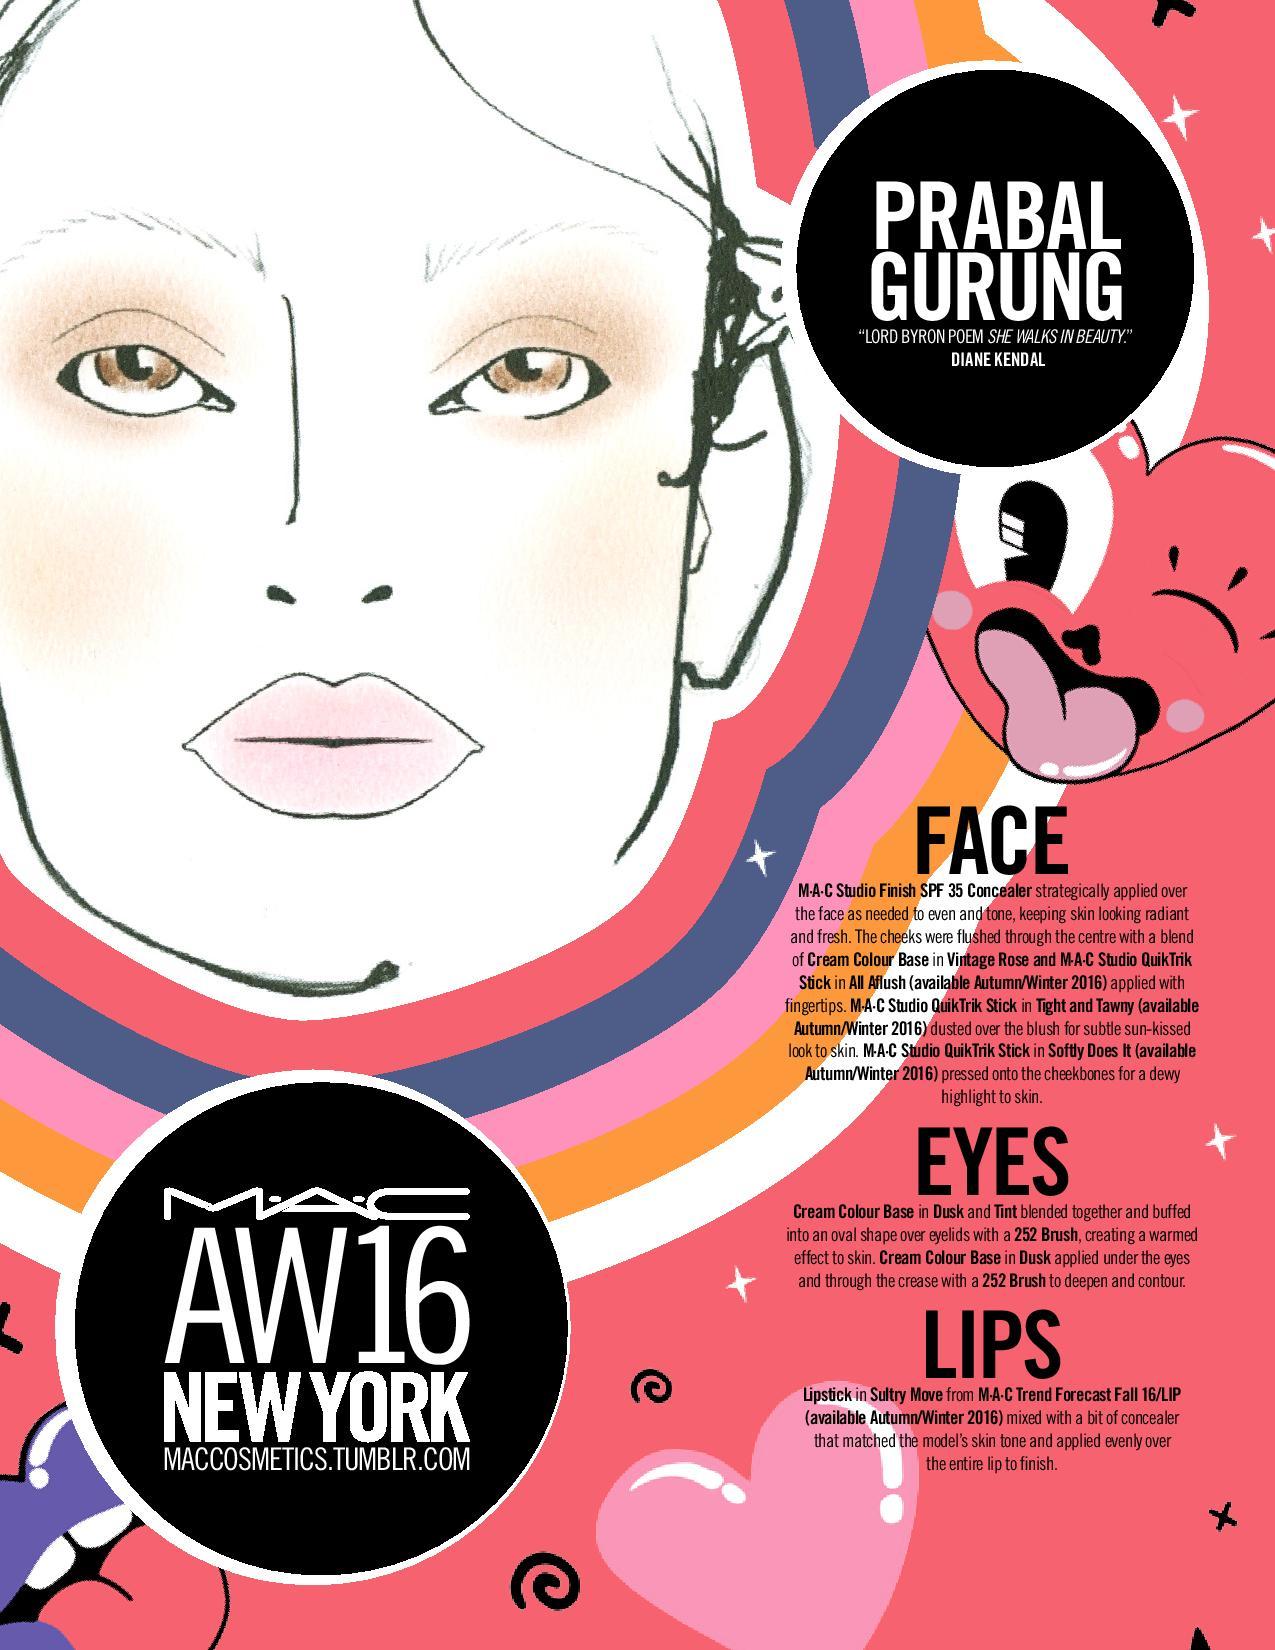 AW16_DAILY FACECHART_NEW YORK_FEB 14 HOOD BY AIR, PRABAL GURUNG)-page-003